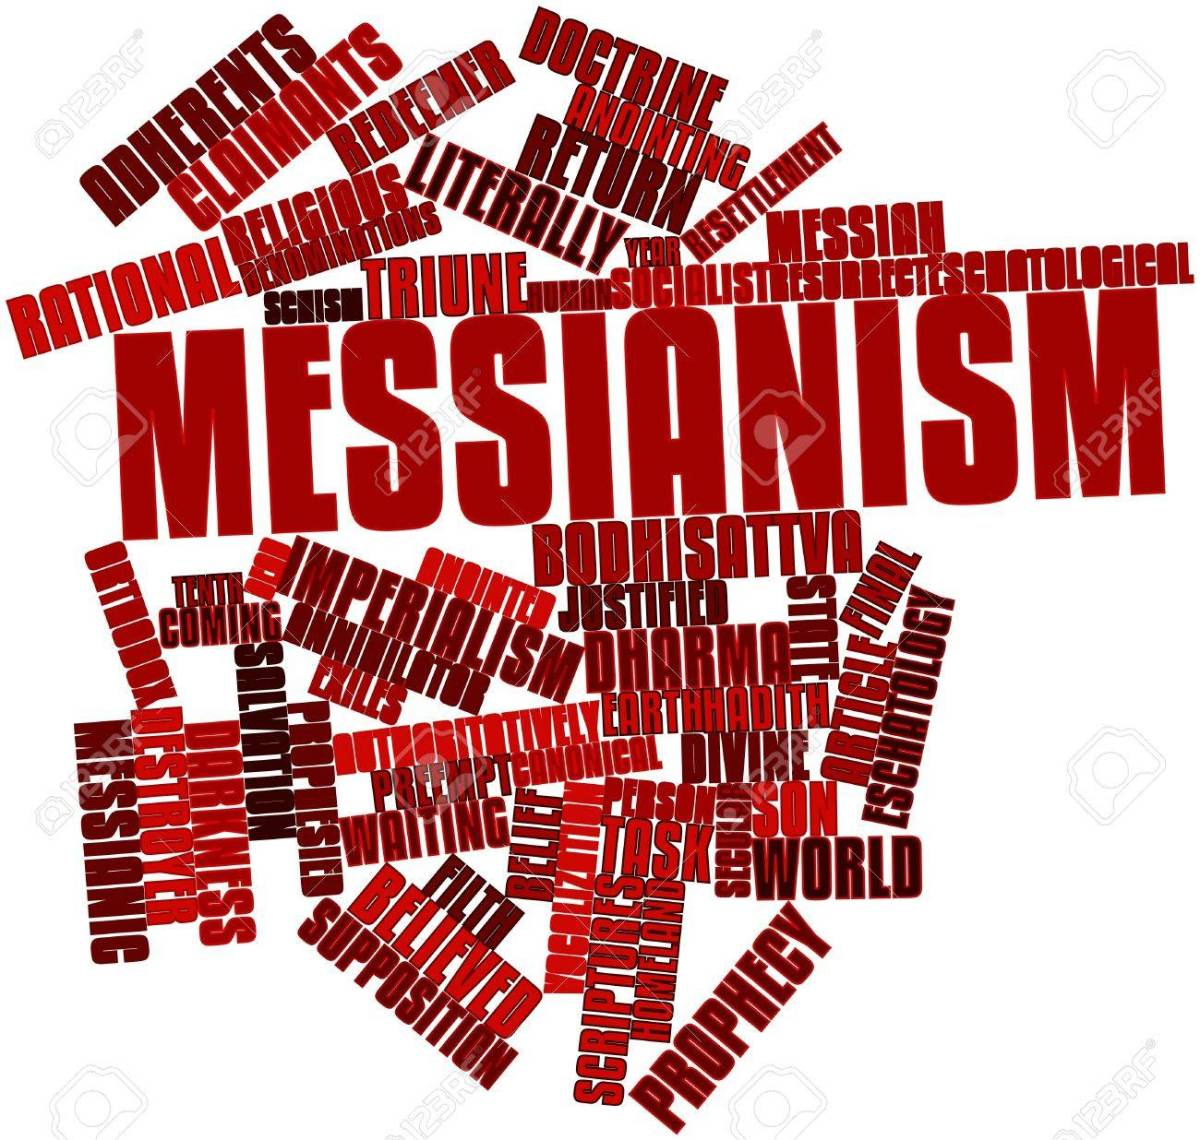 Messianisme : Jérusalem - Trump simple maillon de l'histoire d'Israëlet inversement !